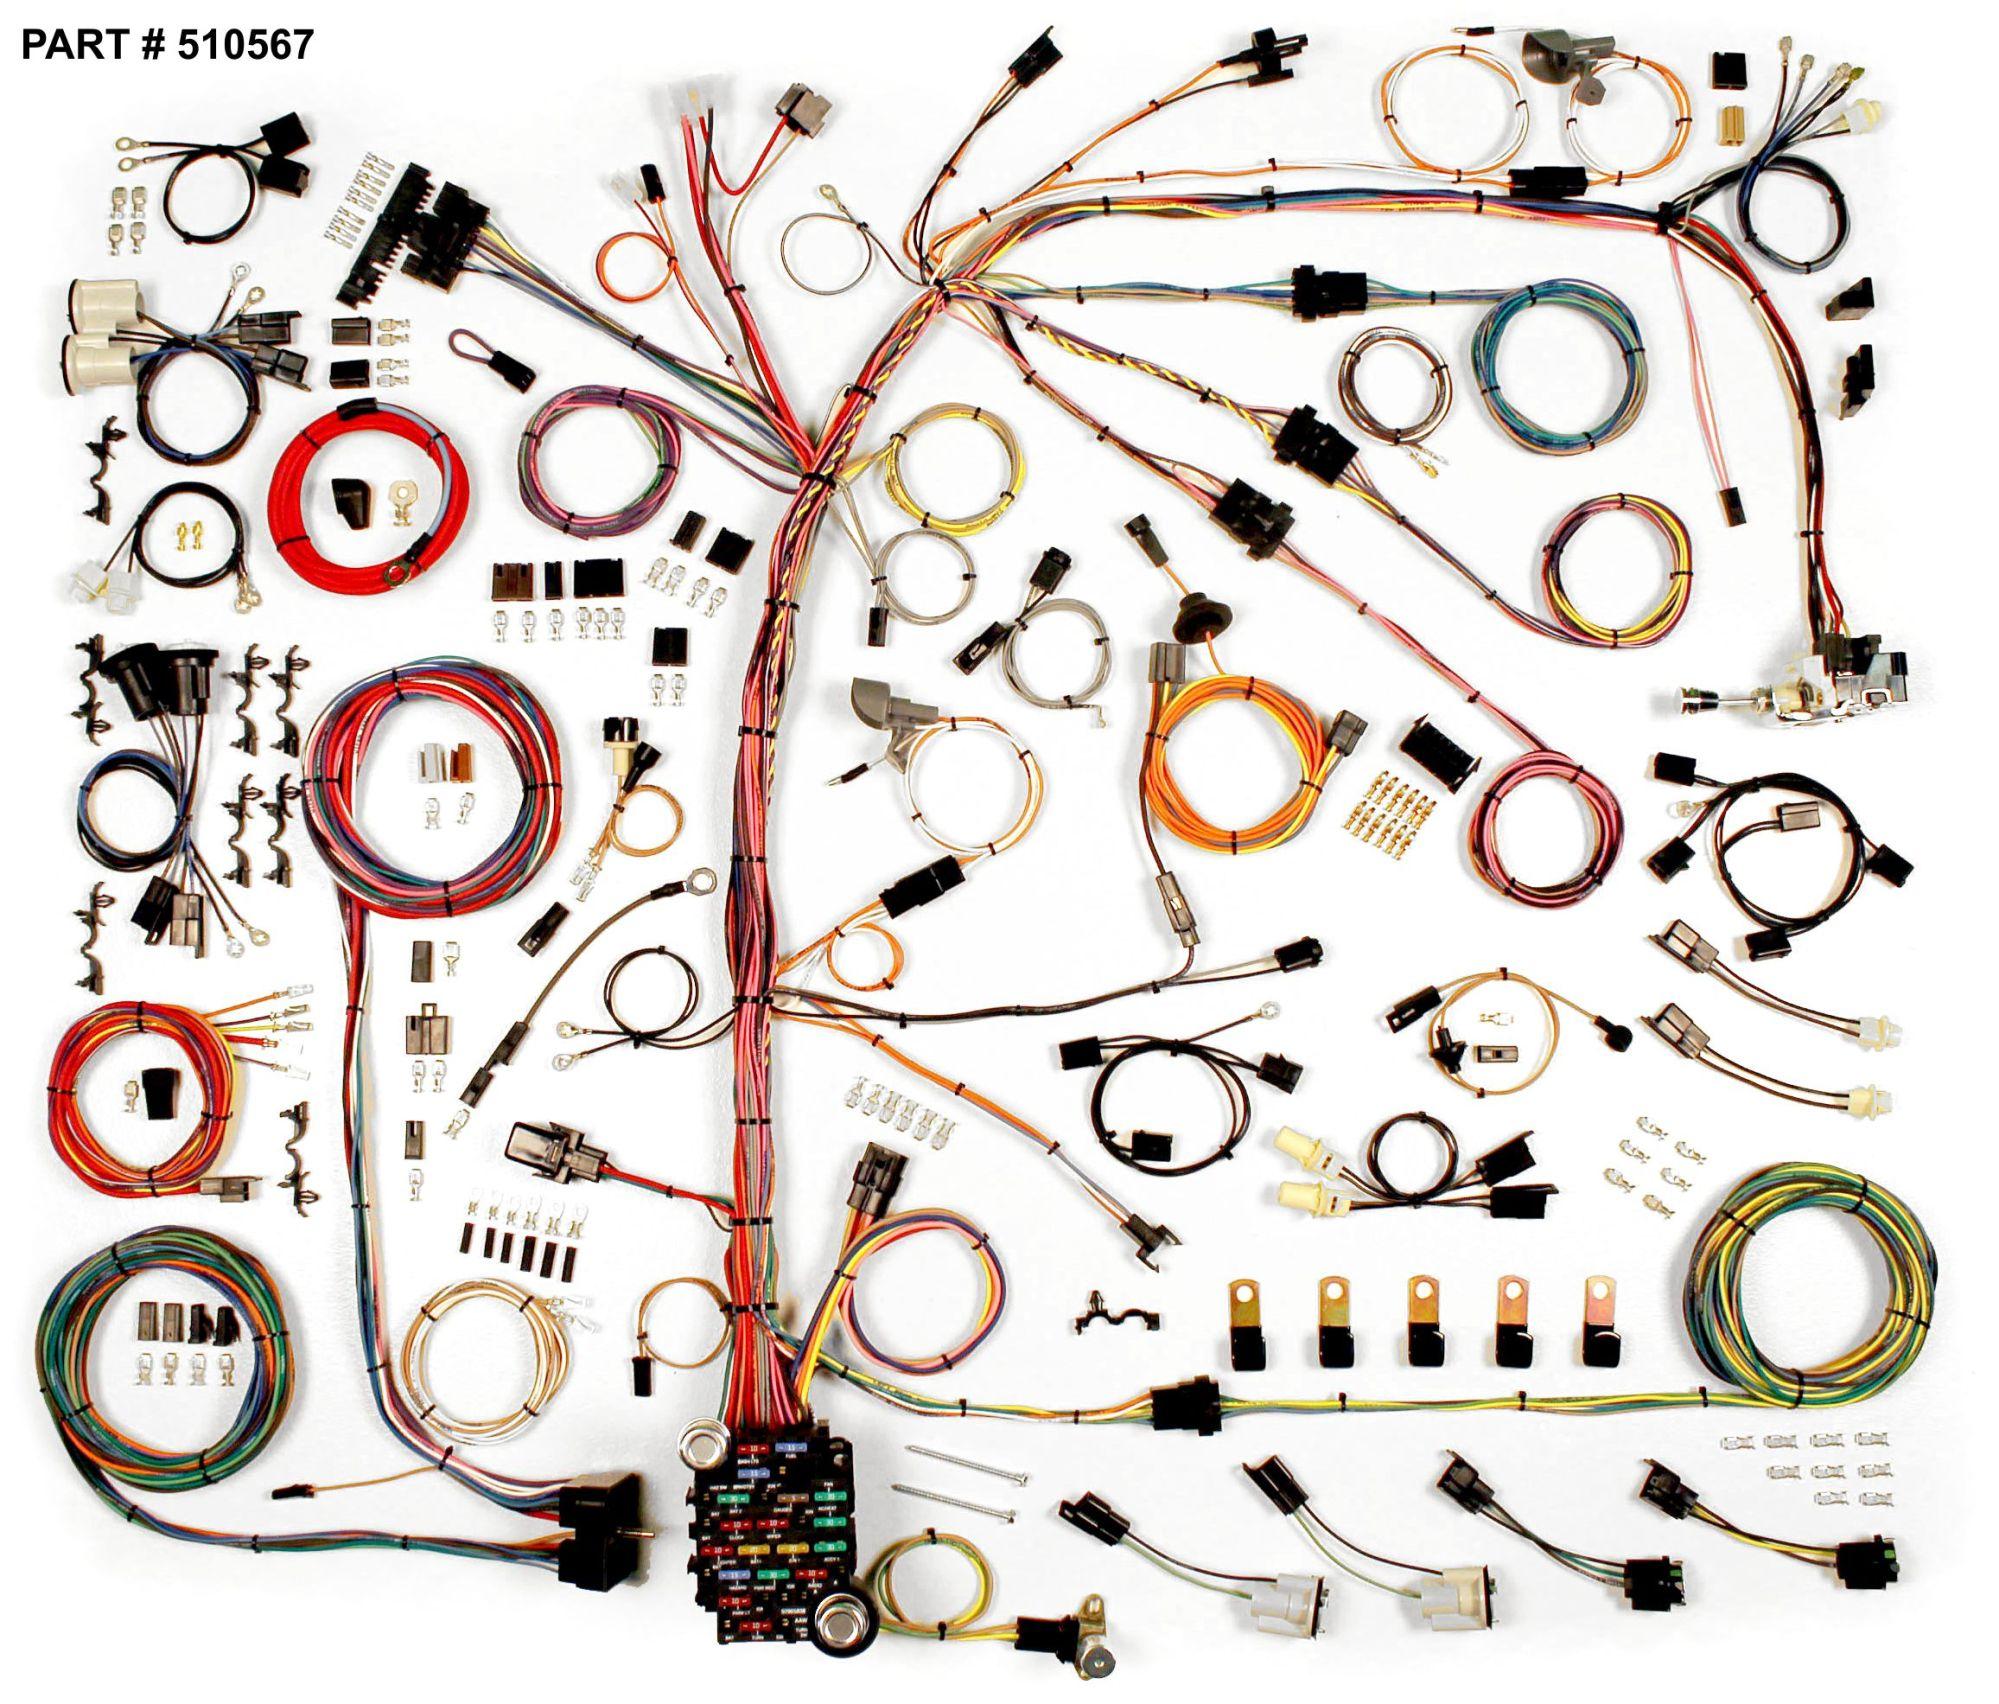 hight resolution of 1974 77 camaro restomod wiring harness system